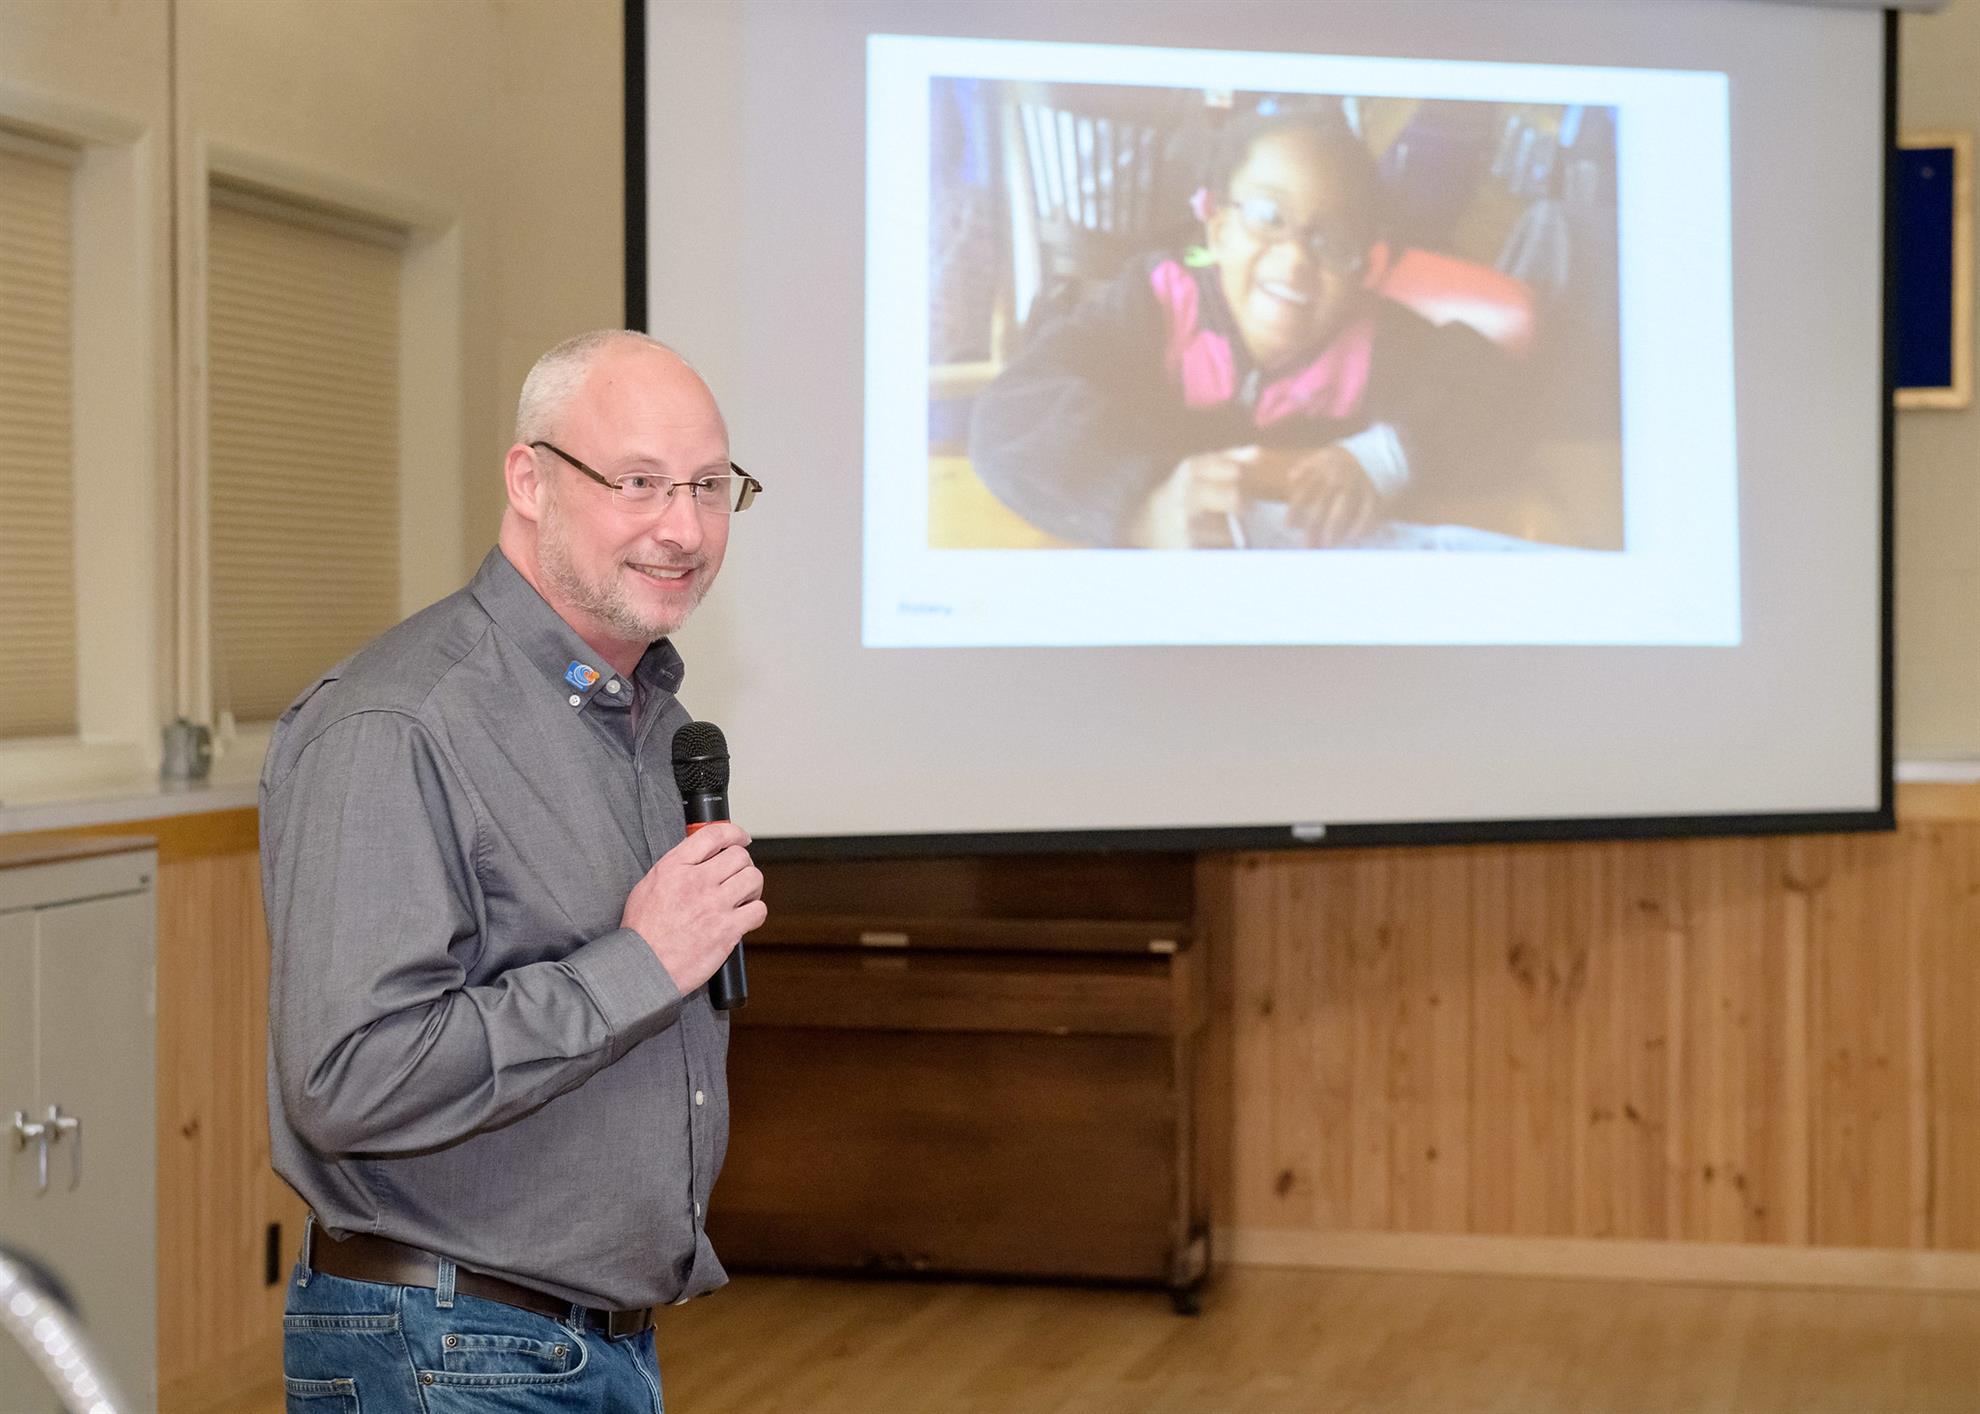 Presentation by Poulsbo Rotary President Tim Nichols